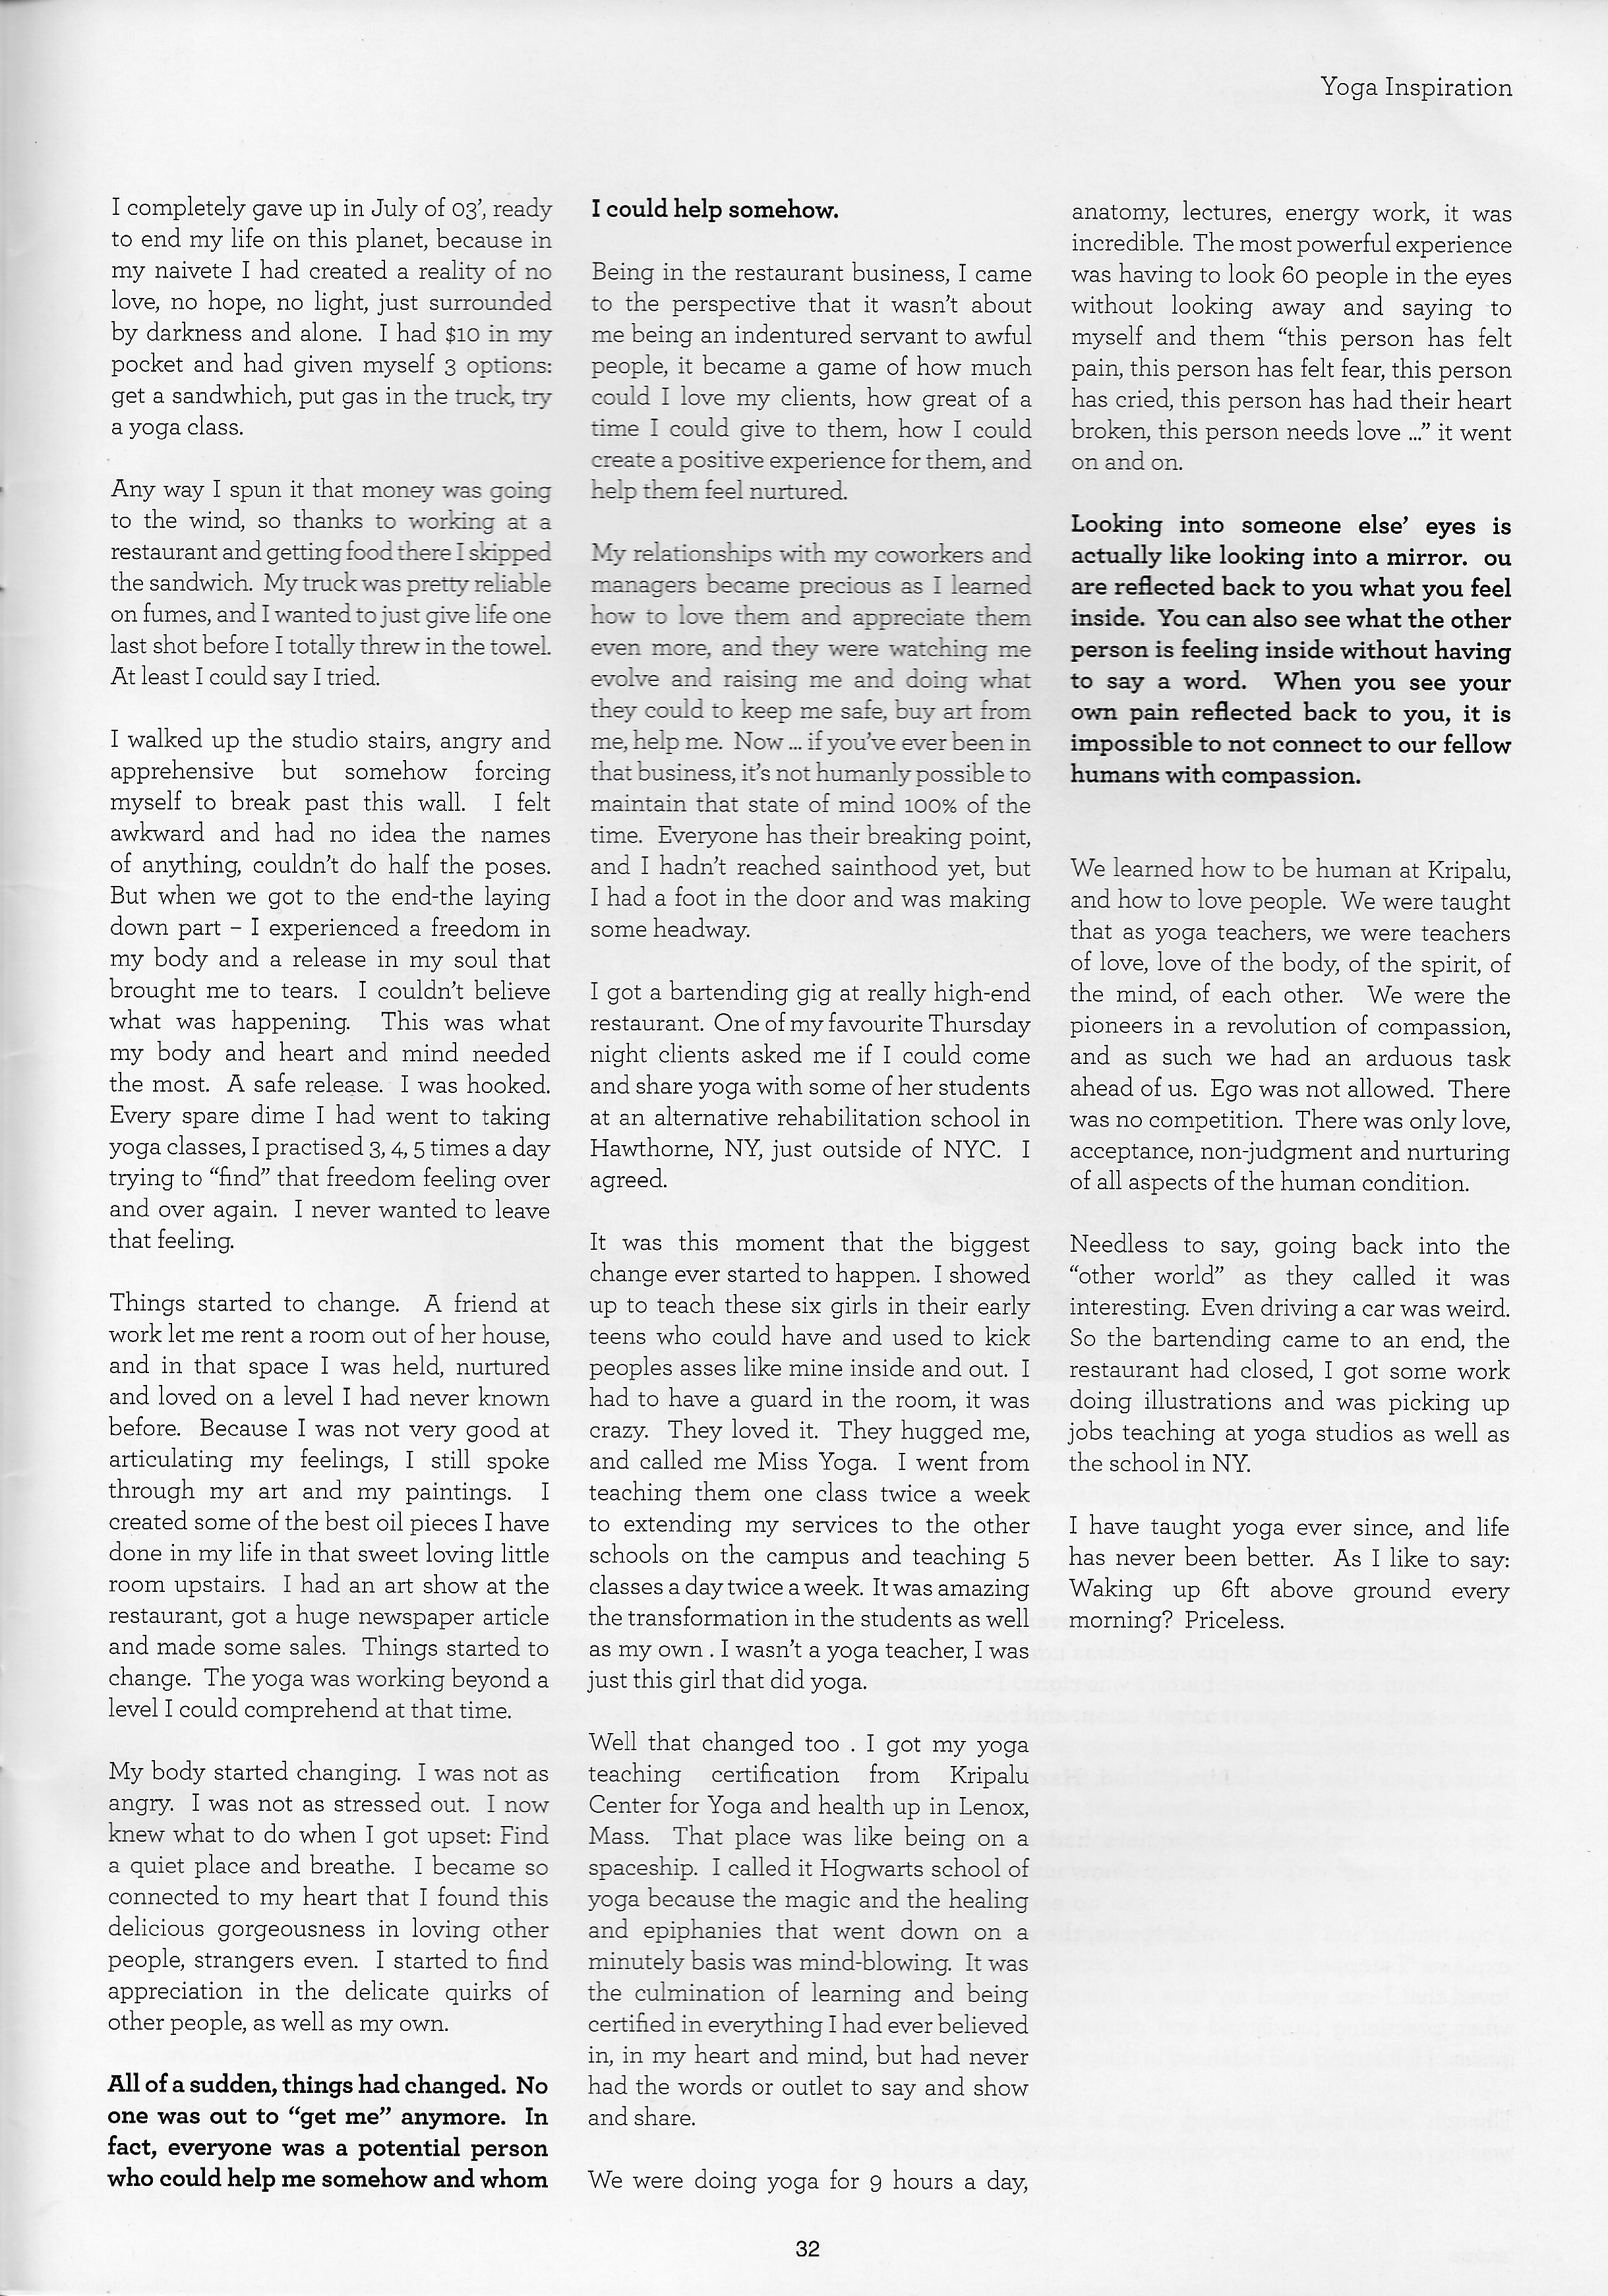 Asana yoga journal page 2